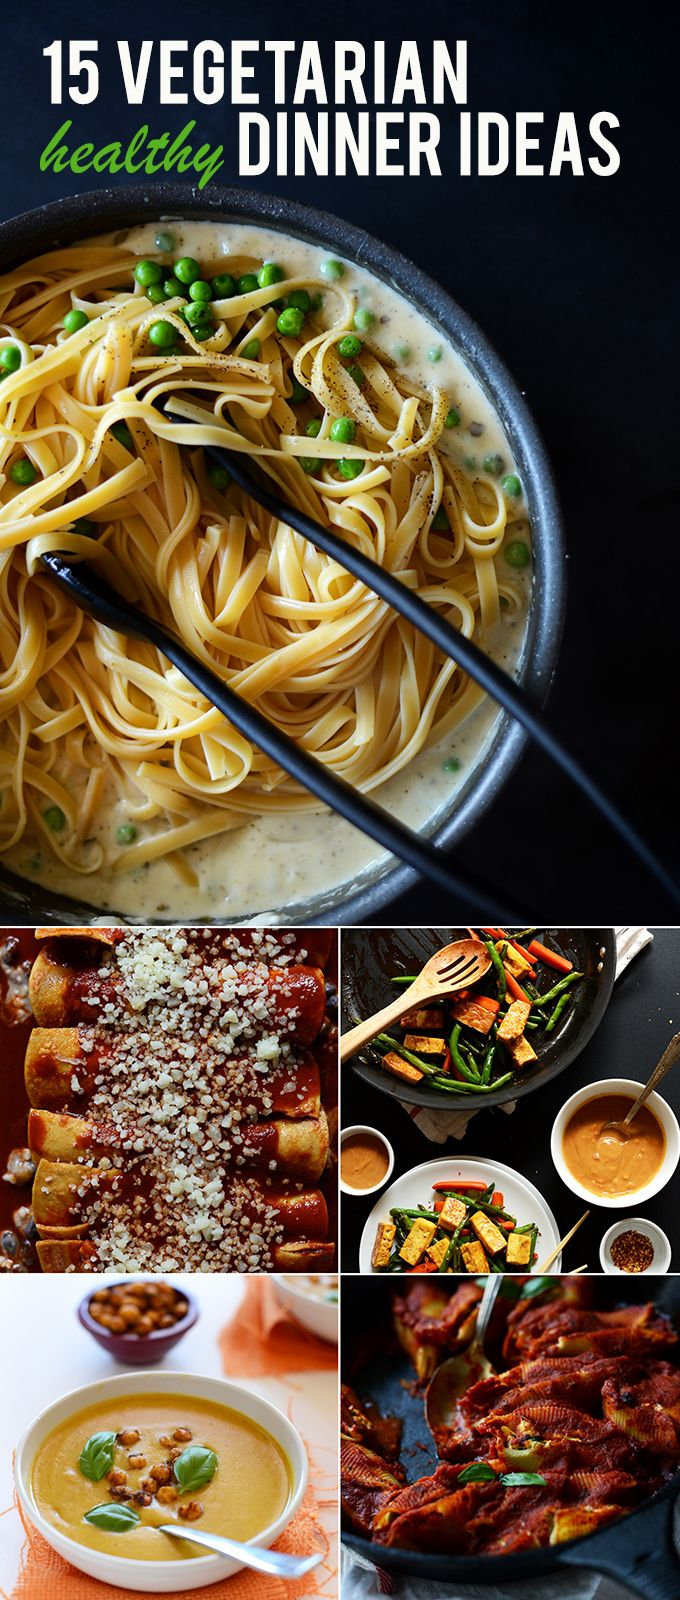 15 Easy, Healthy Vegetarian Dinner Ideas! minimalistbaker.com #vegetarian